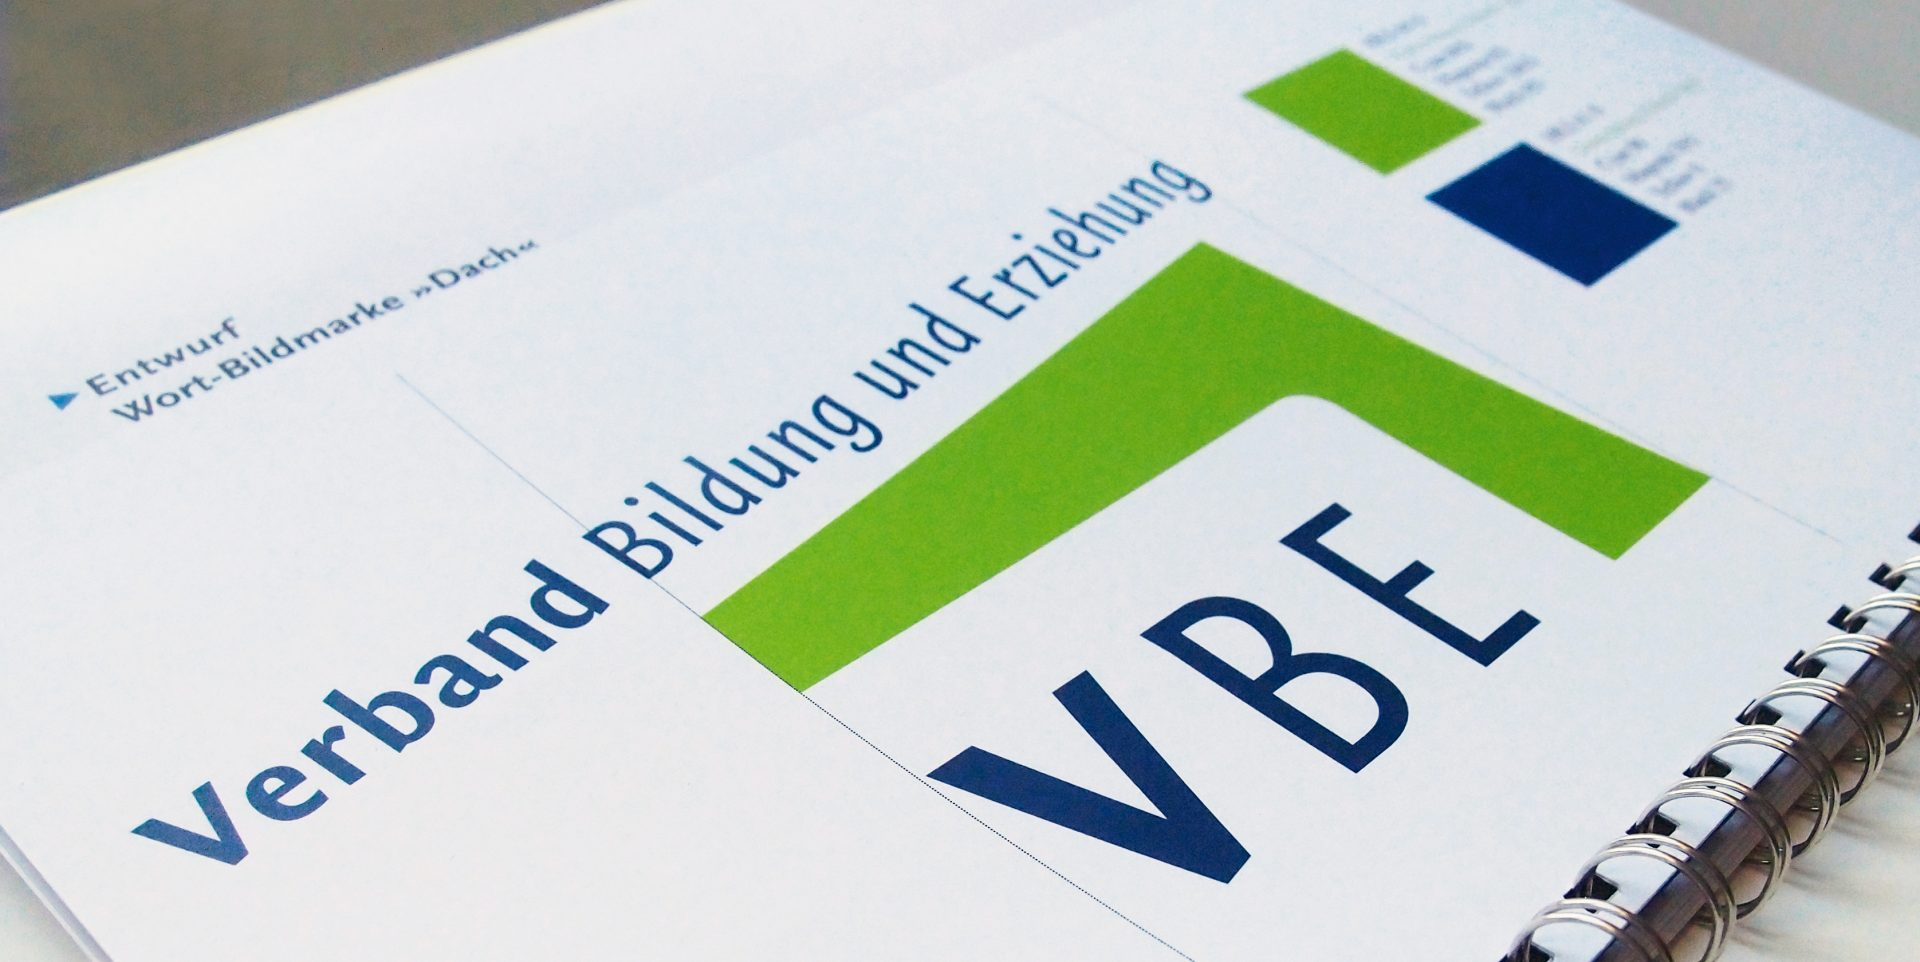 Designmanual für das neue Corporate Design des VBE - Typoly